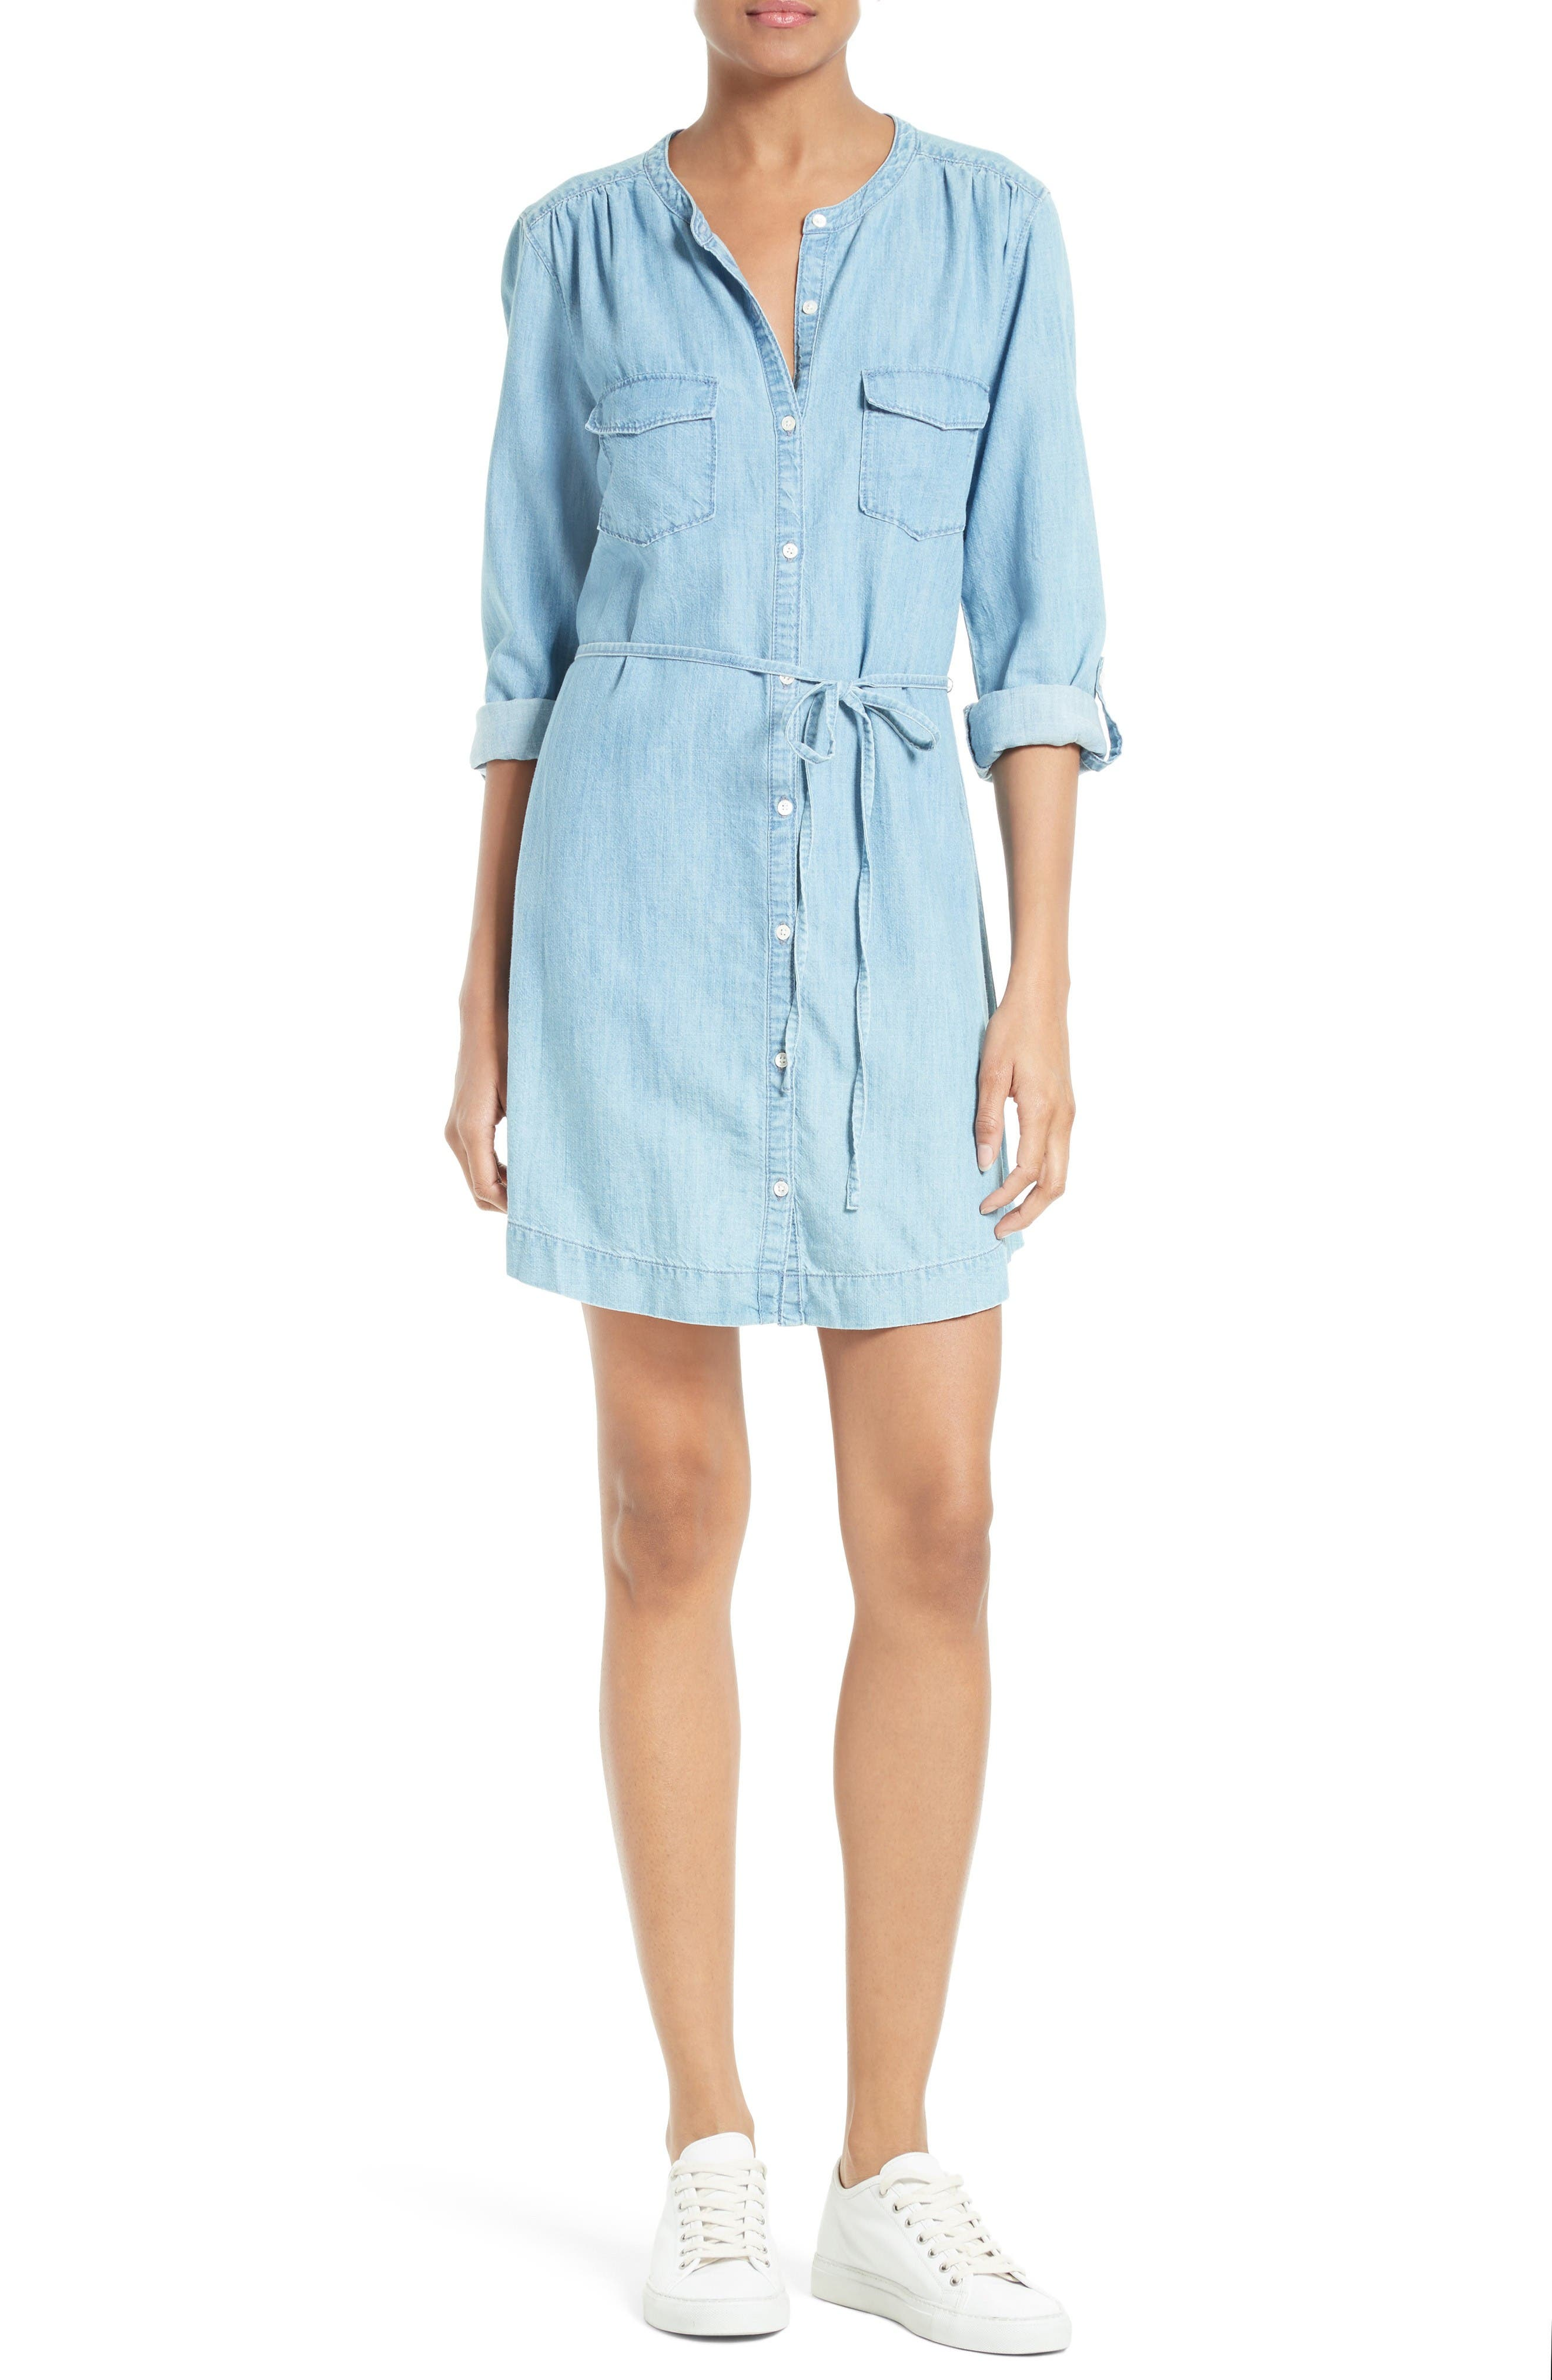 Alternate Image 1 Selected - Soft Joie Milli Chambray Shirtdress